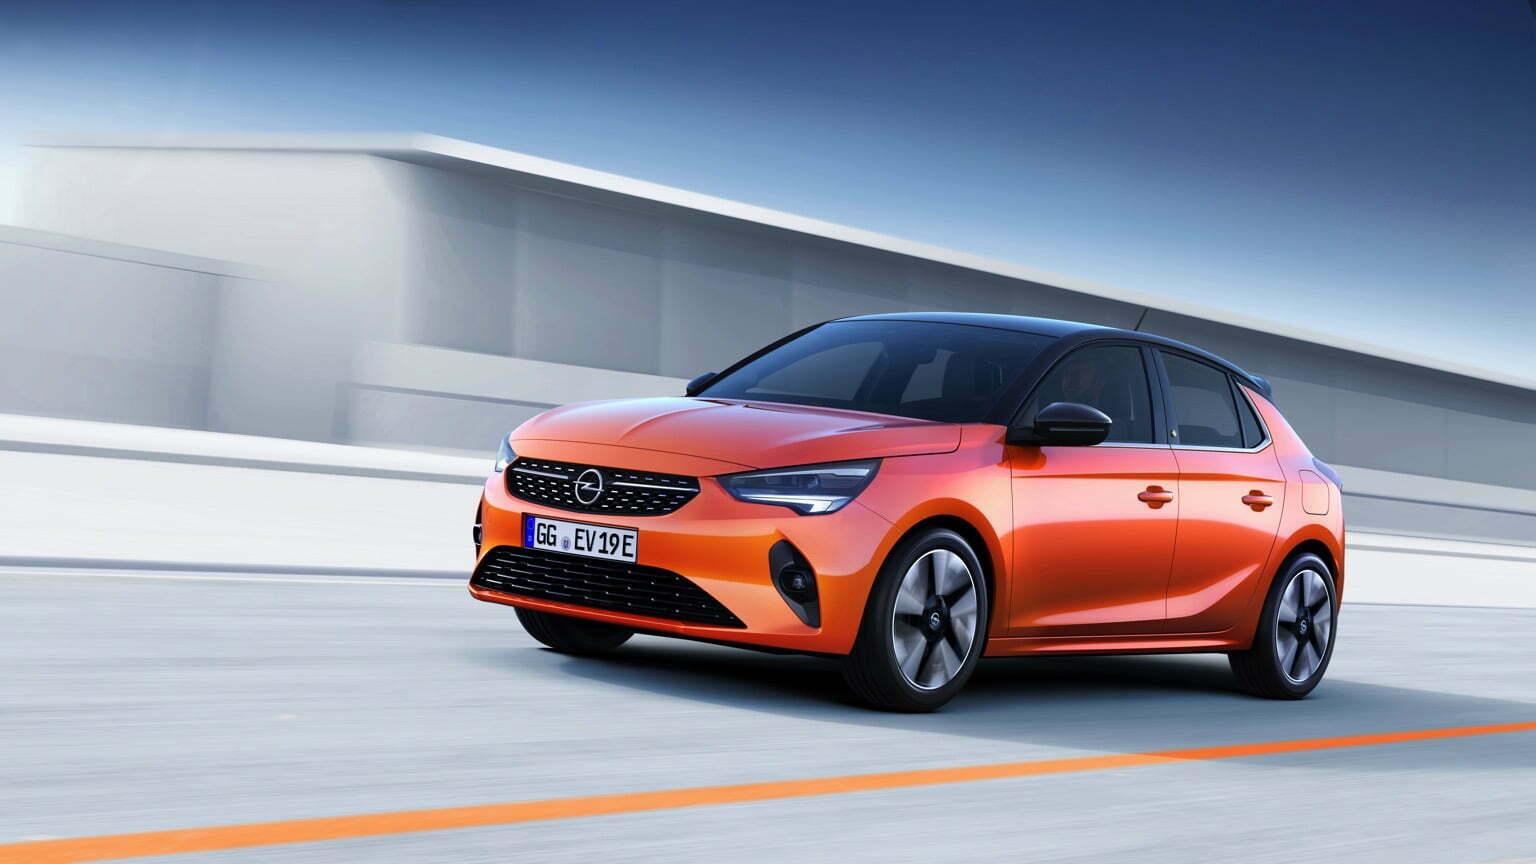 Opel_Corsa-e-01@2x